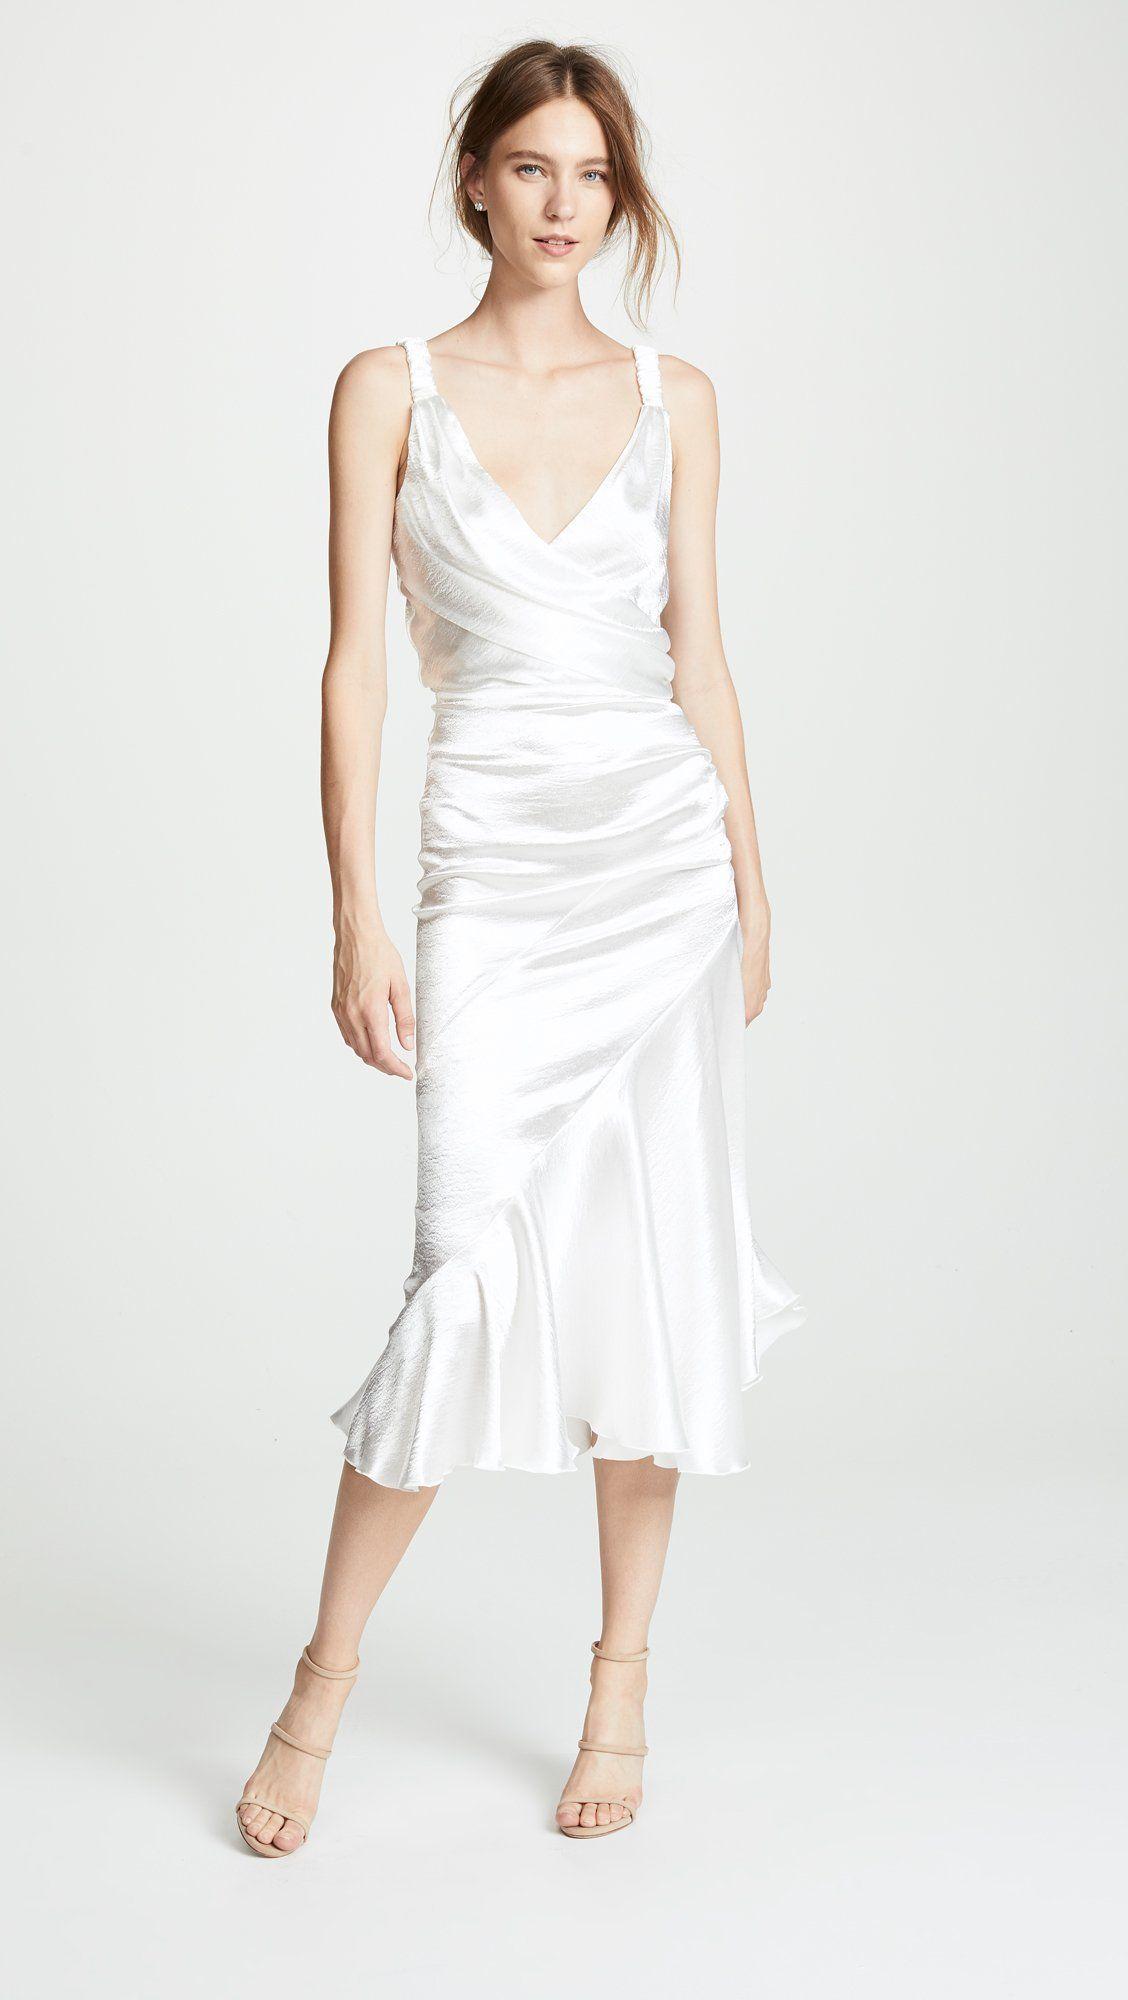 Under 1000 Dollar Wedding Dresses Cheap Bridal Gowns Weddingdressesunder 1000 Short Wedding Dress Dresses Affordable Wedding Dresses